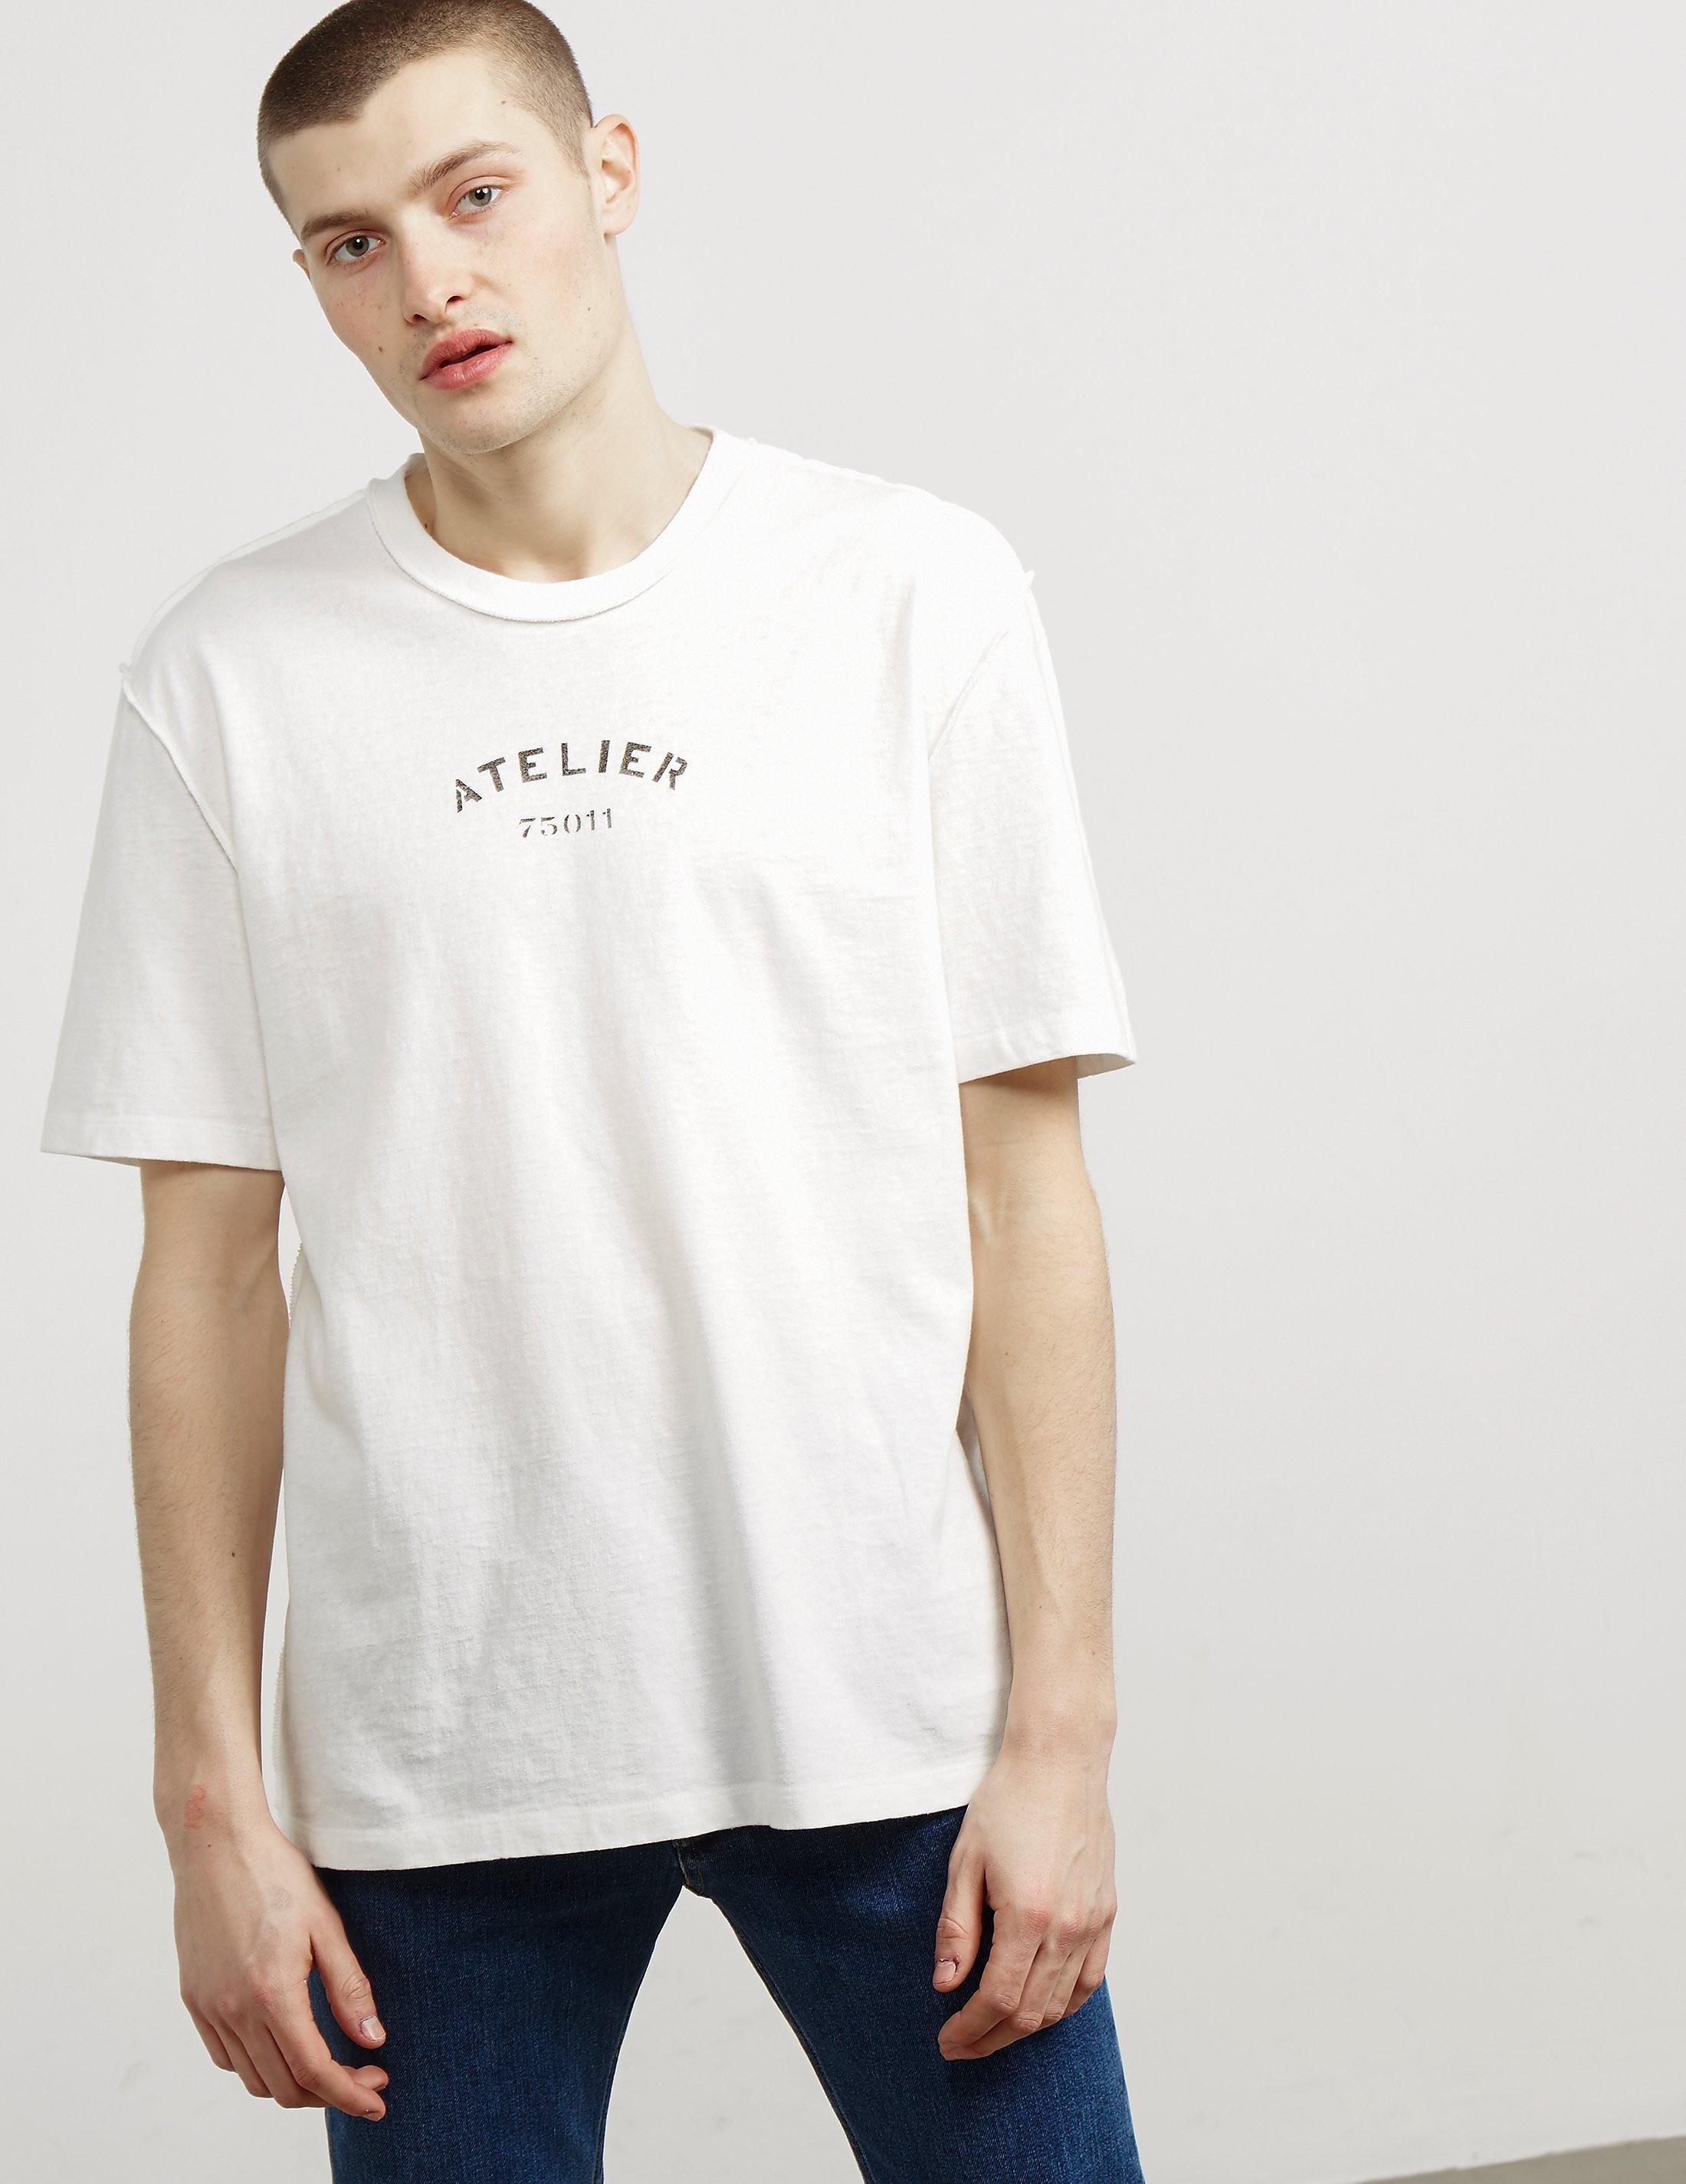 Maison Margiela Atelier Short Sleeve T-Shirt